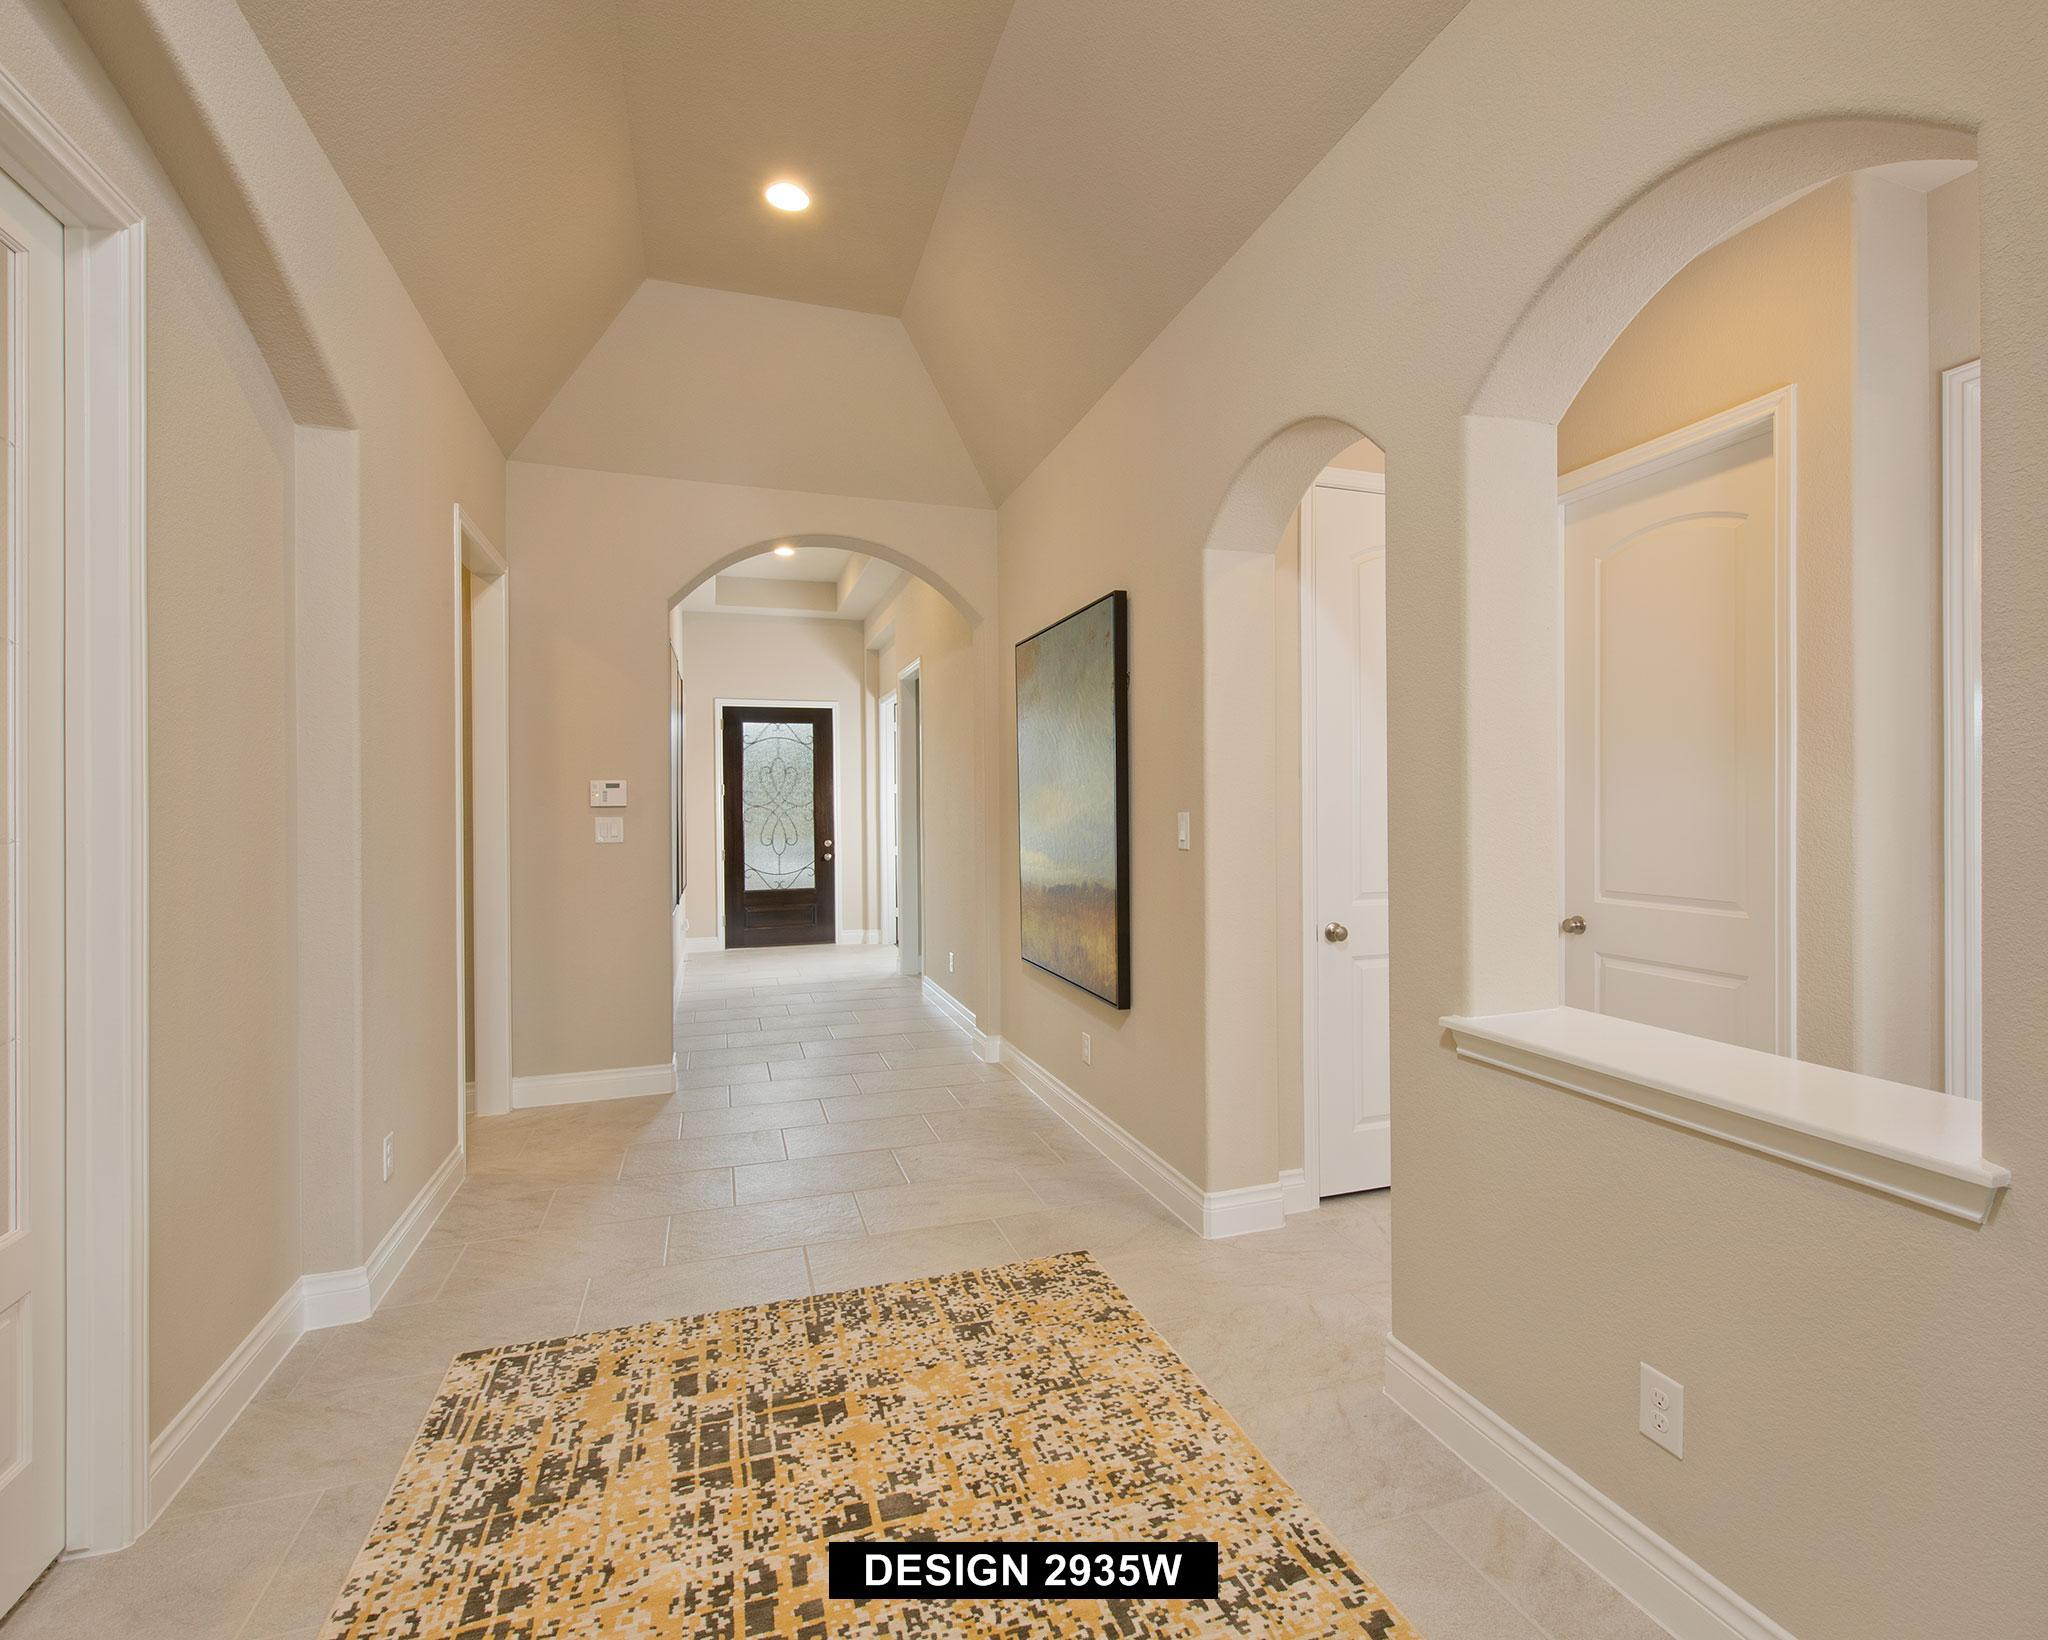 Foyer-in-2935W-at-Bryson 60'-in-Leander